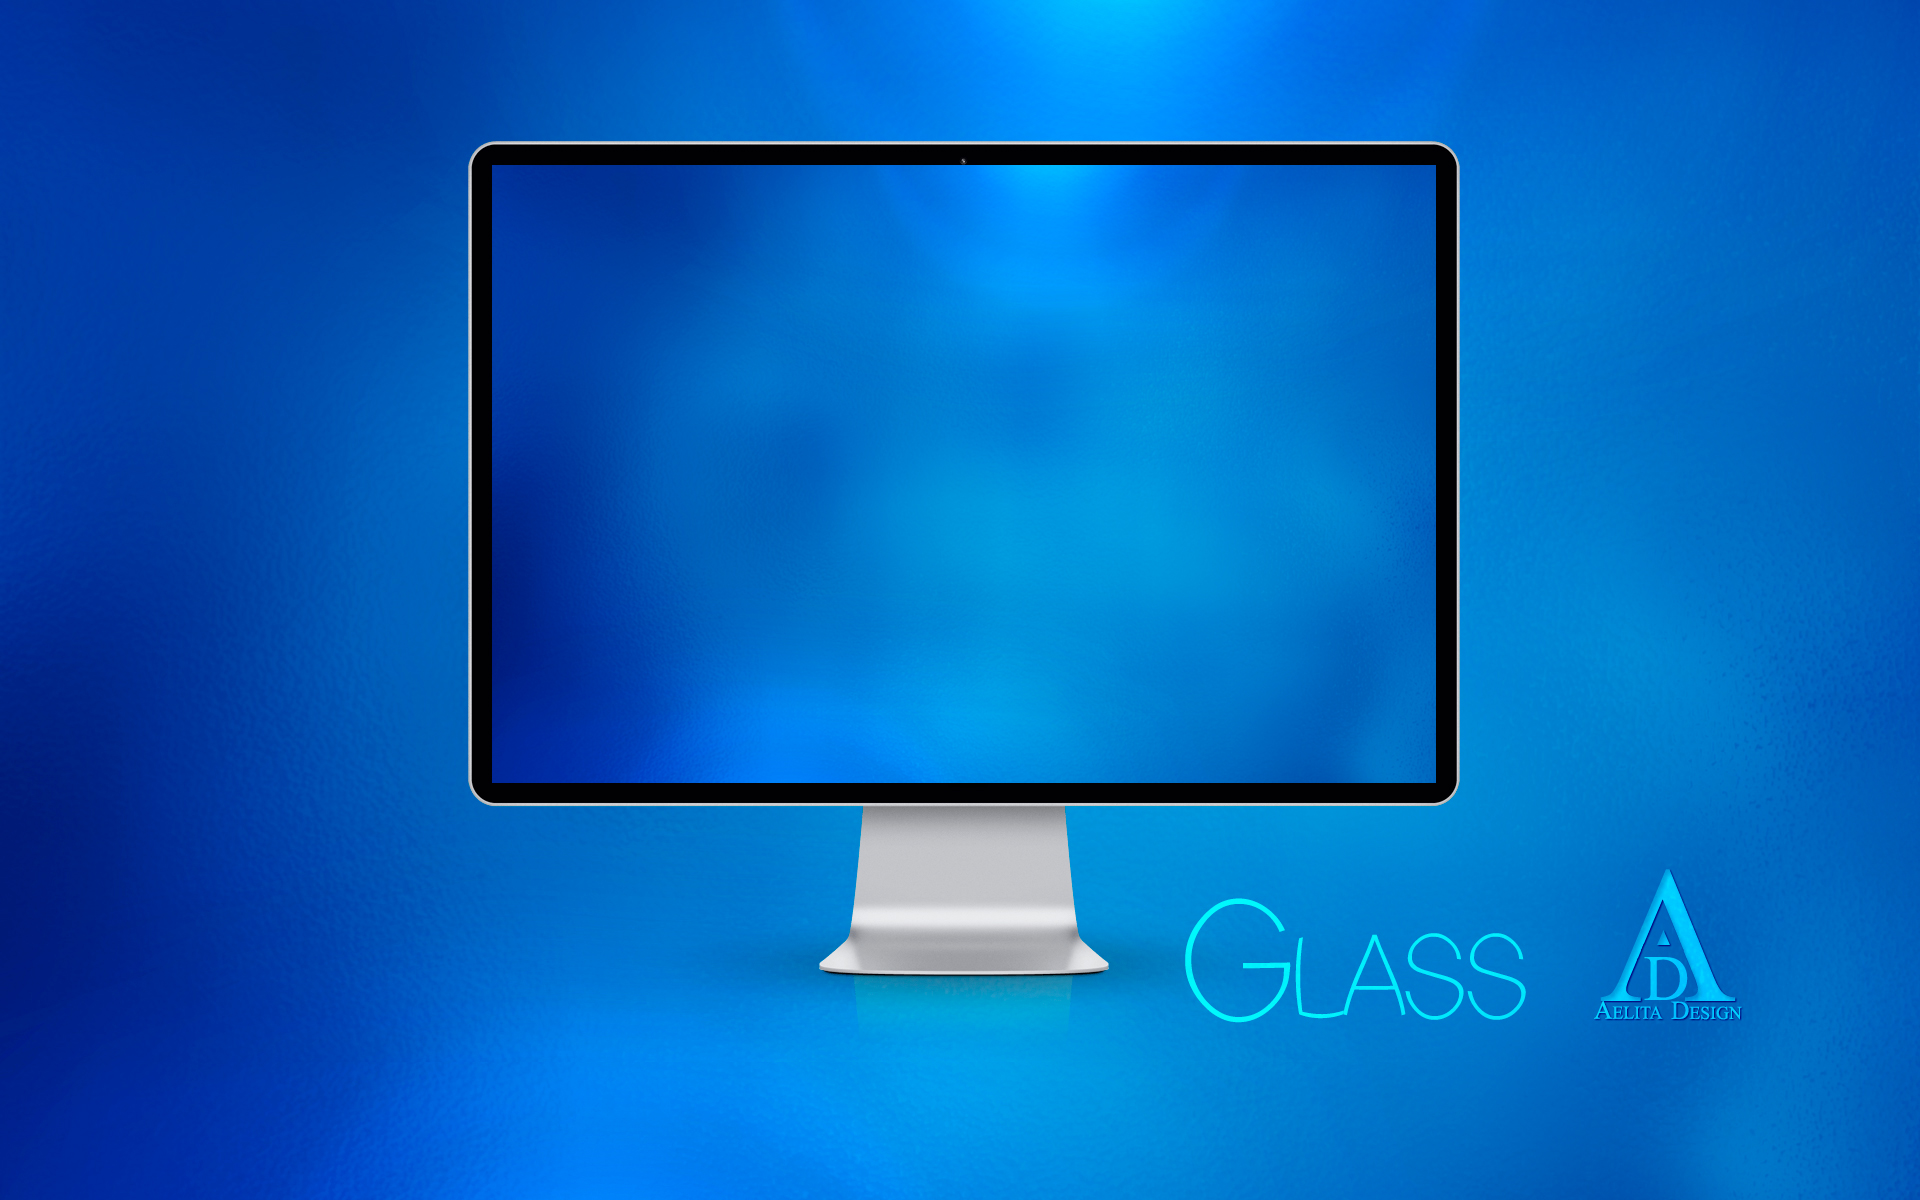 Blue Glass Wallpaper by aeli9